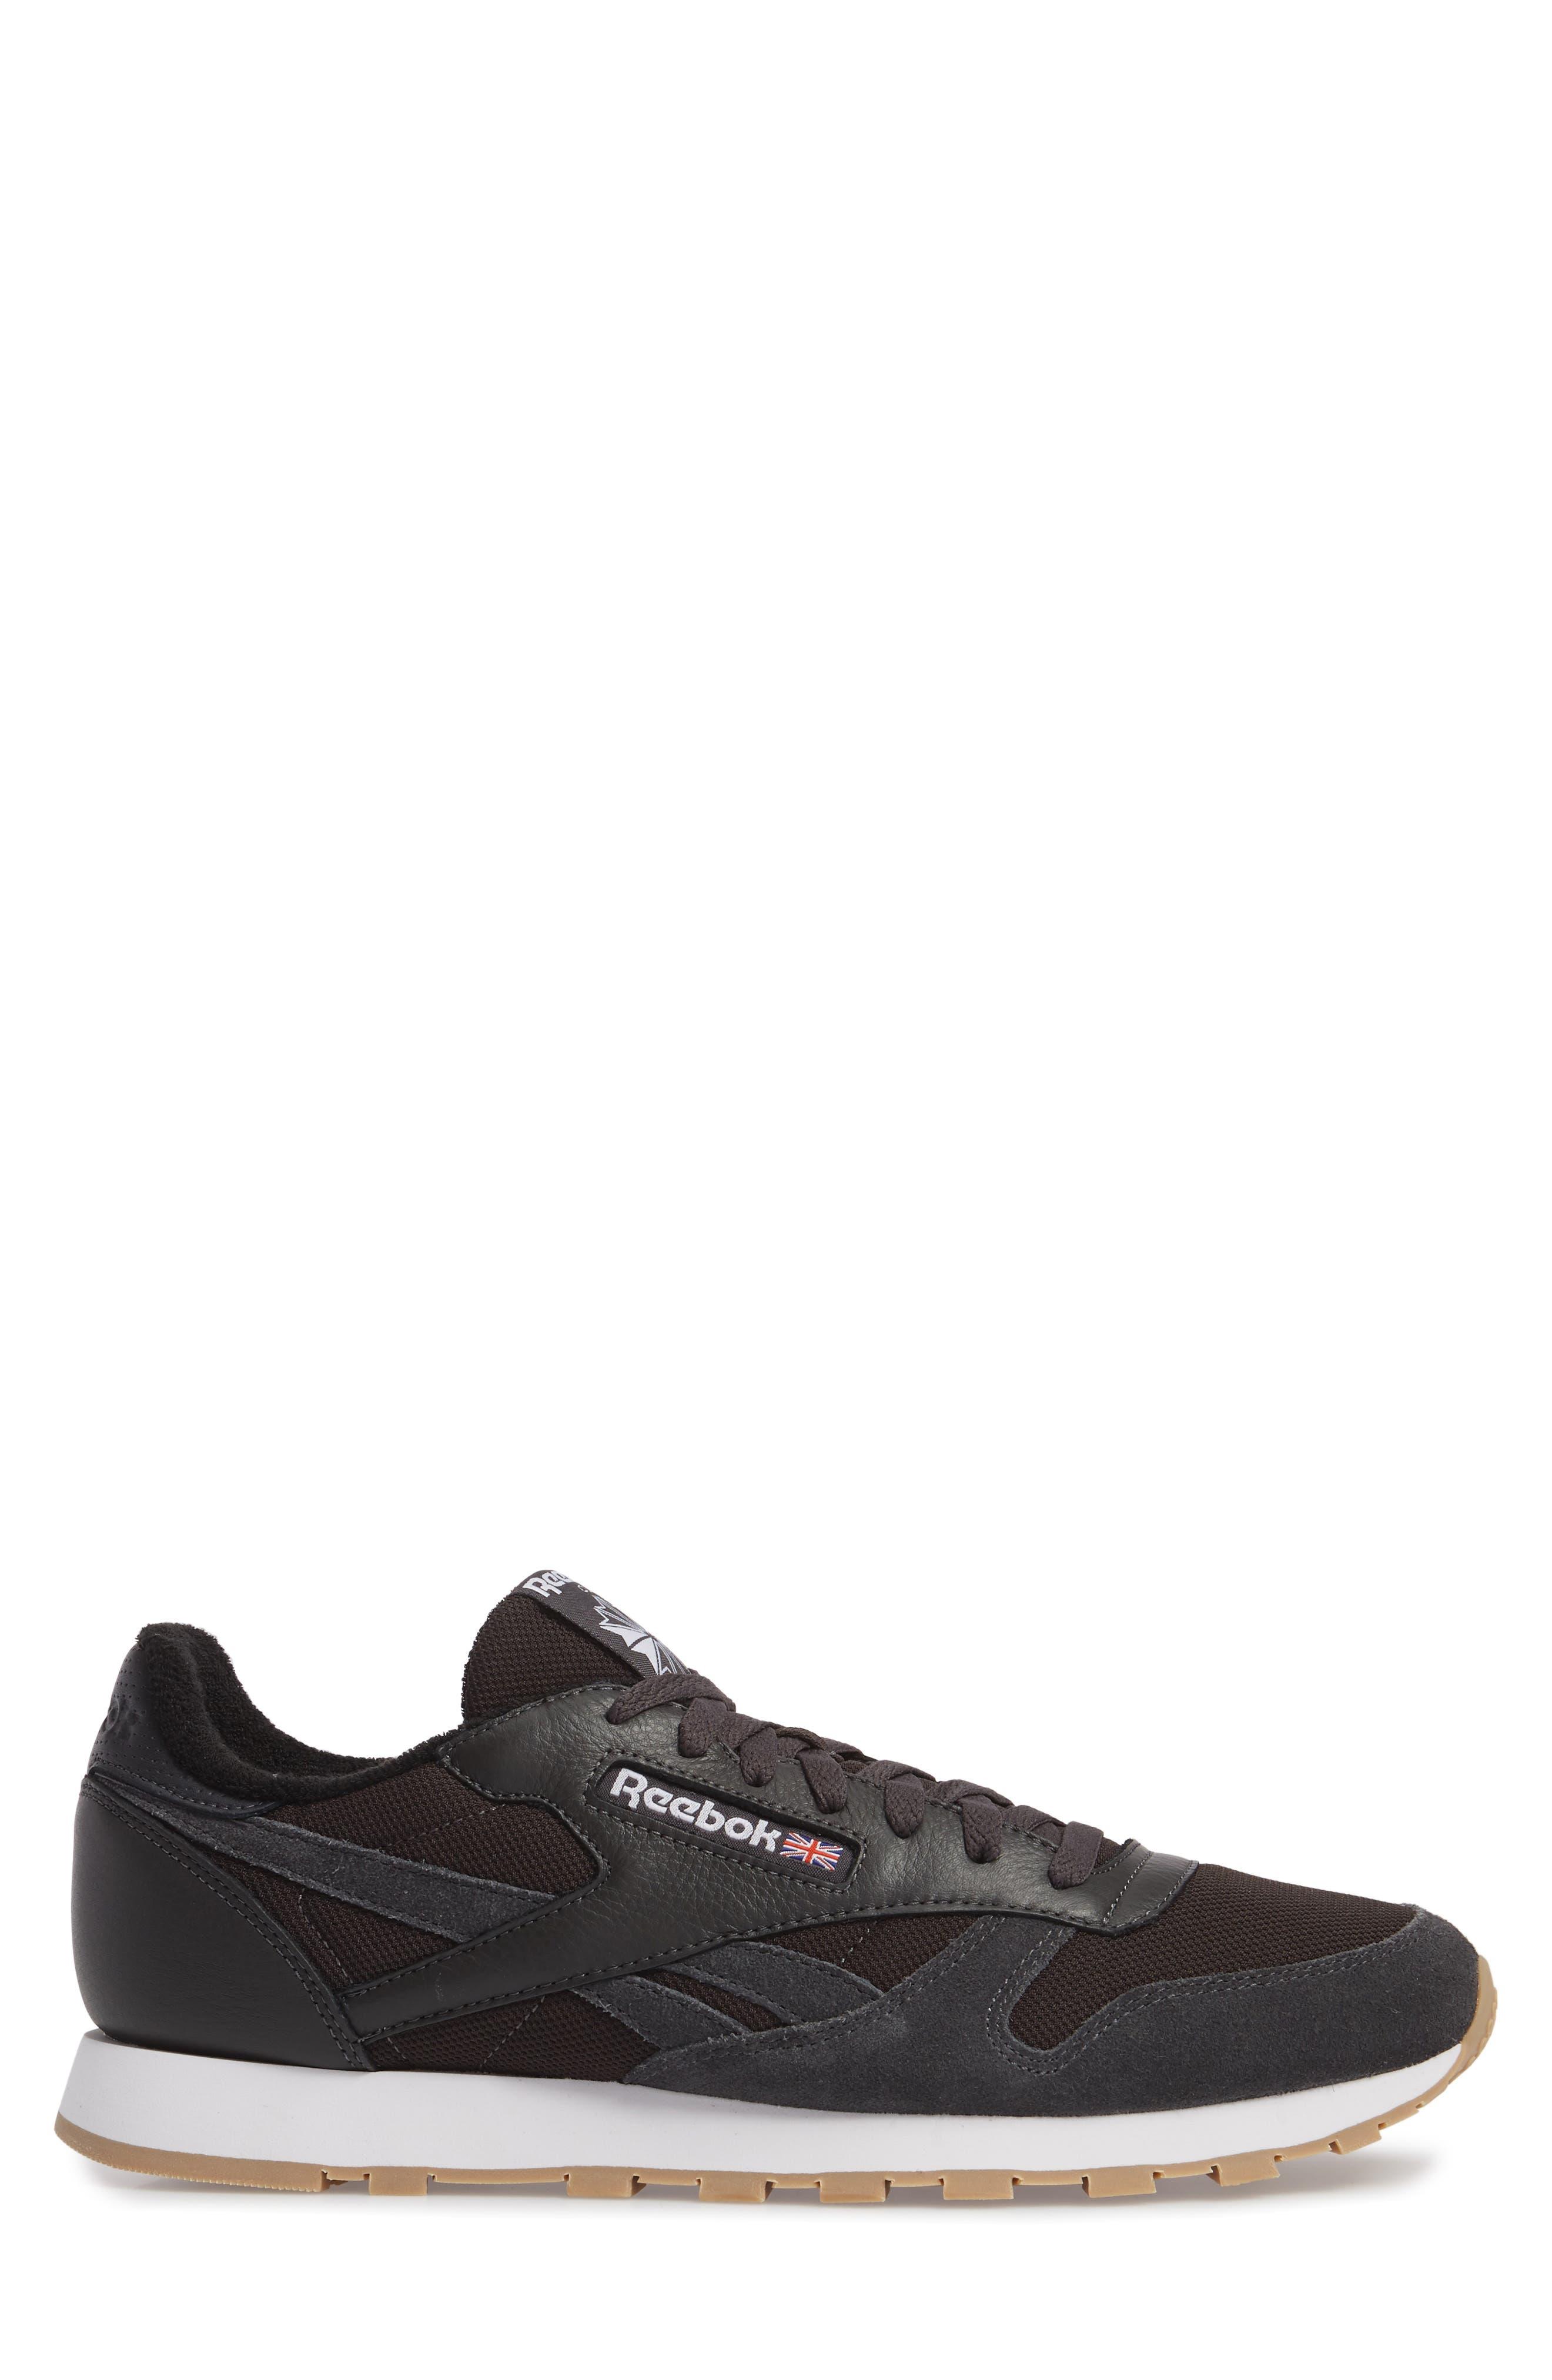 ESTL Classic Leather Sneaker,                             Alternate thumbnail 3, color,                             001